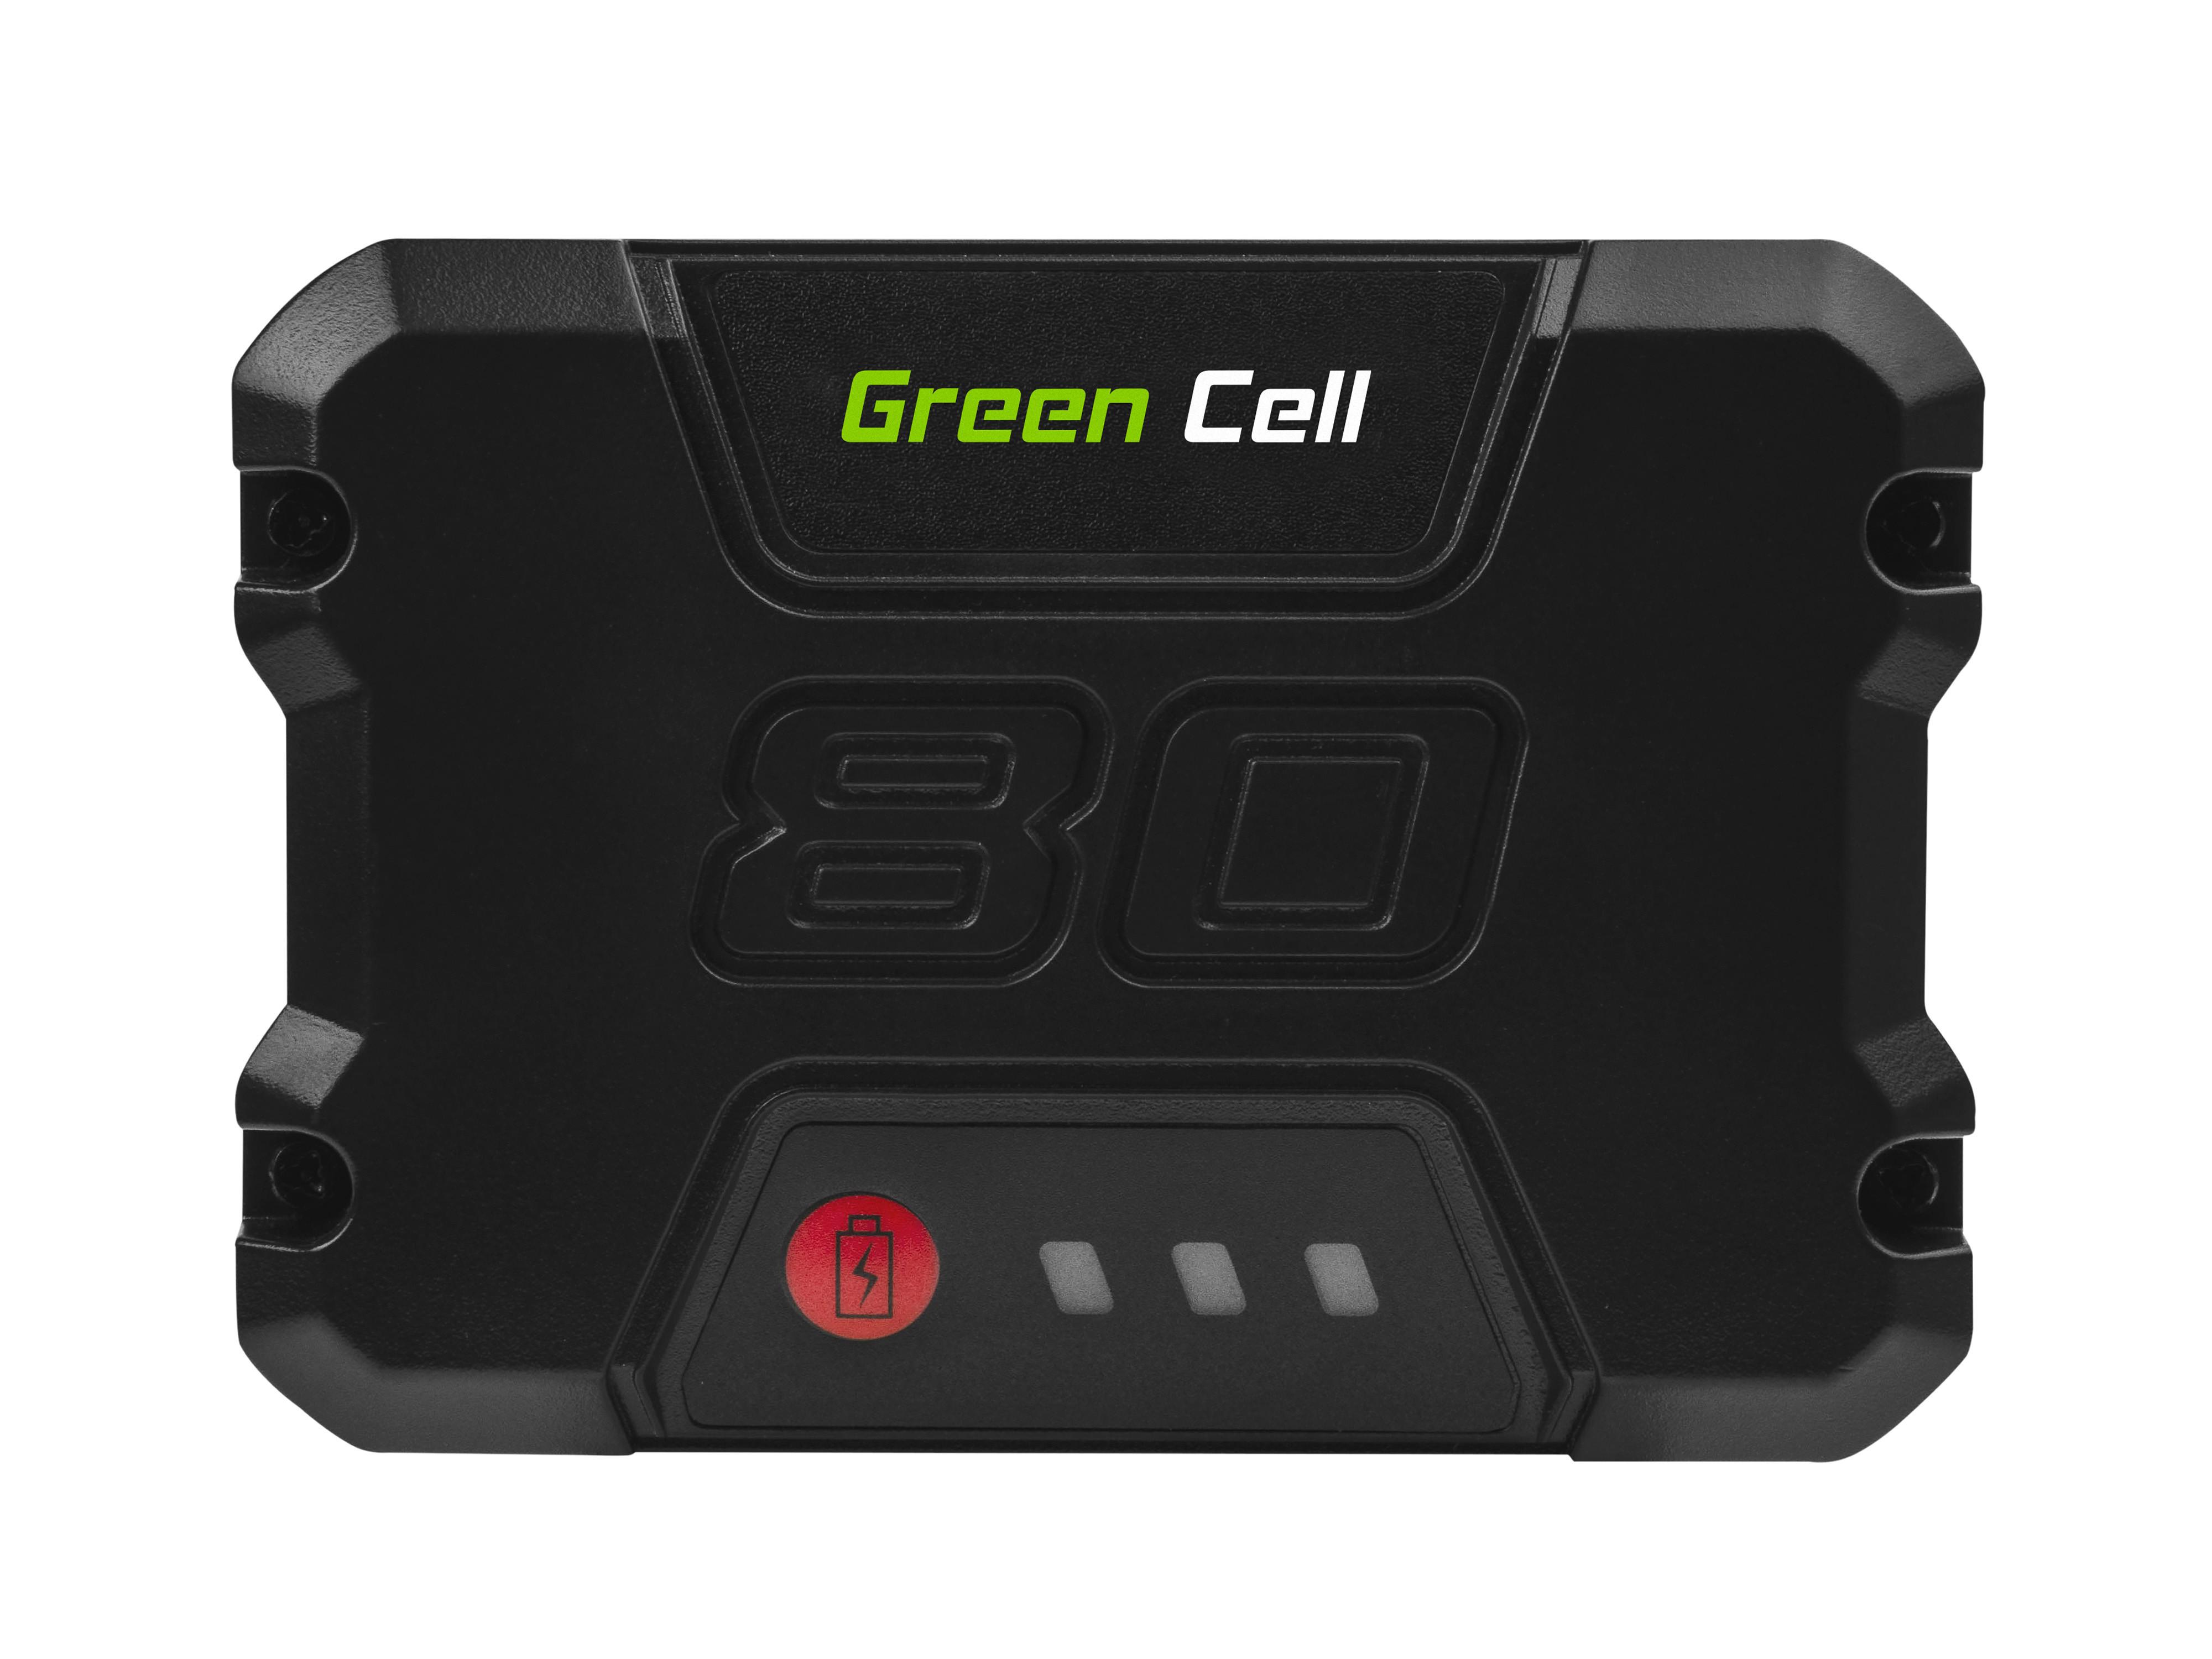 Green Cell PT249 Baterie Green Works GBA80200 2901302,GreenWorks Pro 80V GHT80321 GBL80300 ST80L210 80V 2000mAh Li-ion - neoriginální